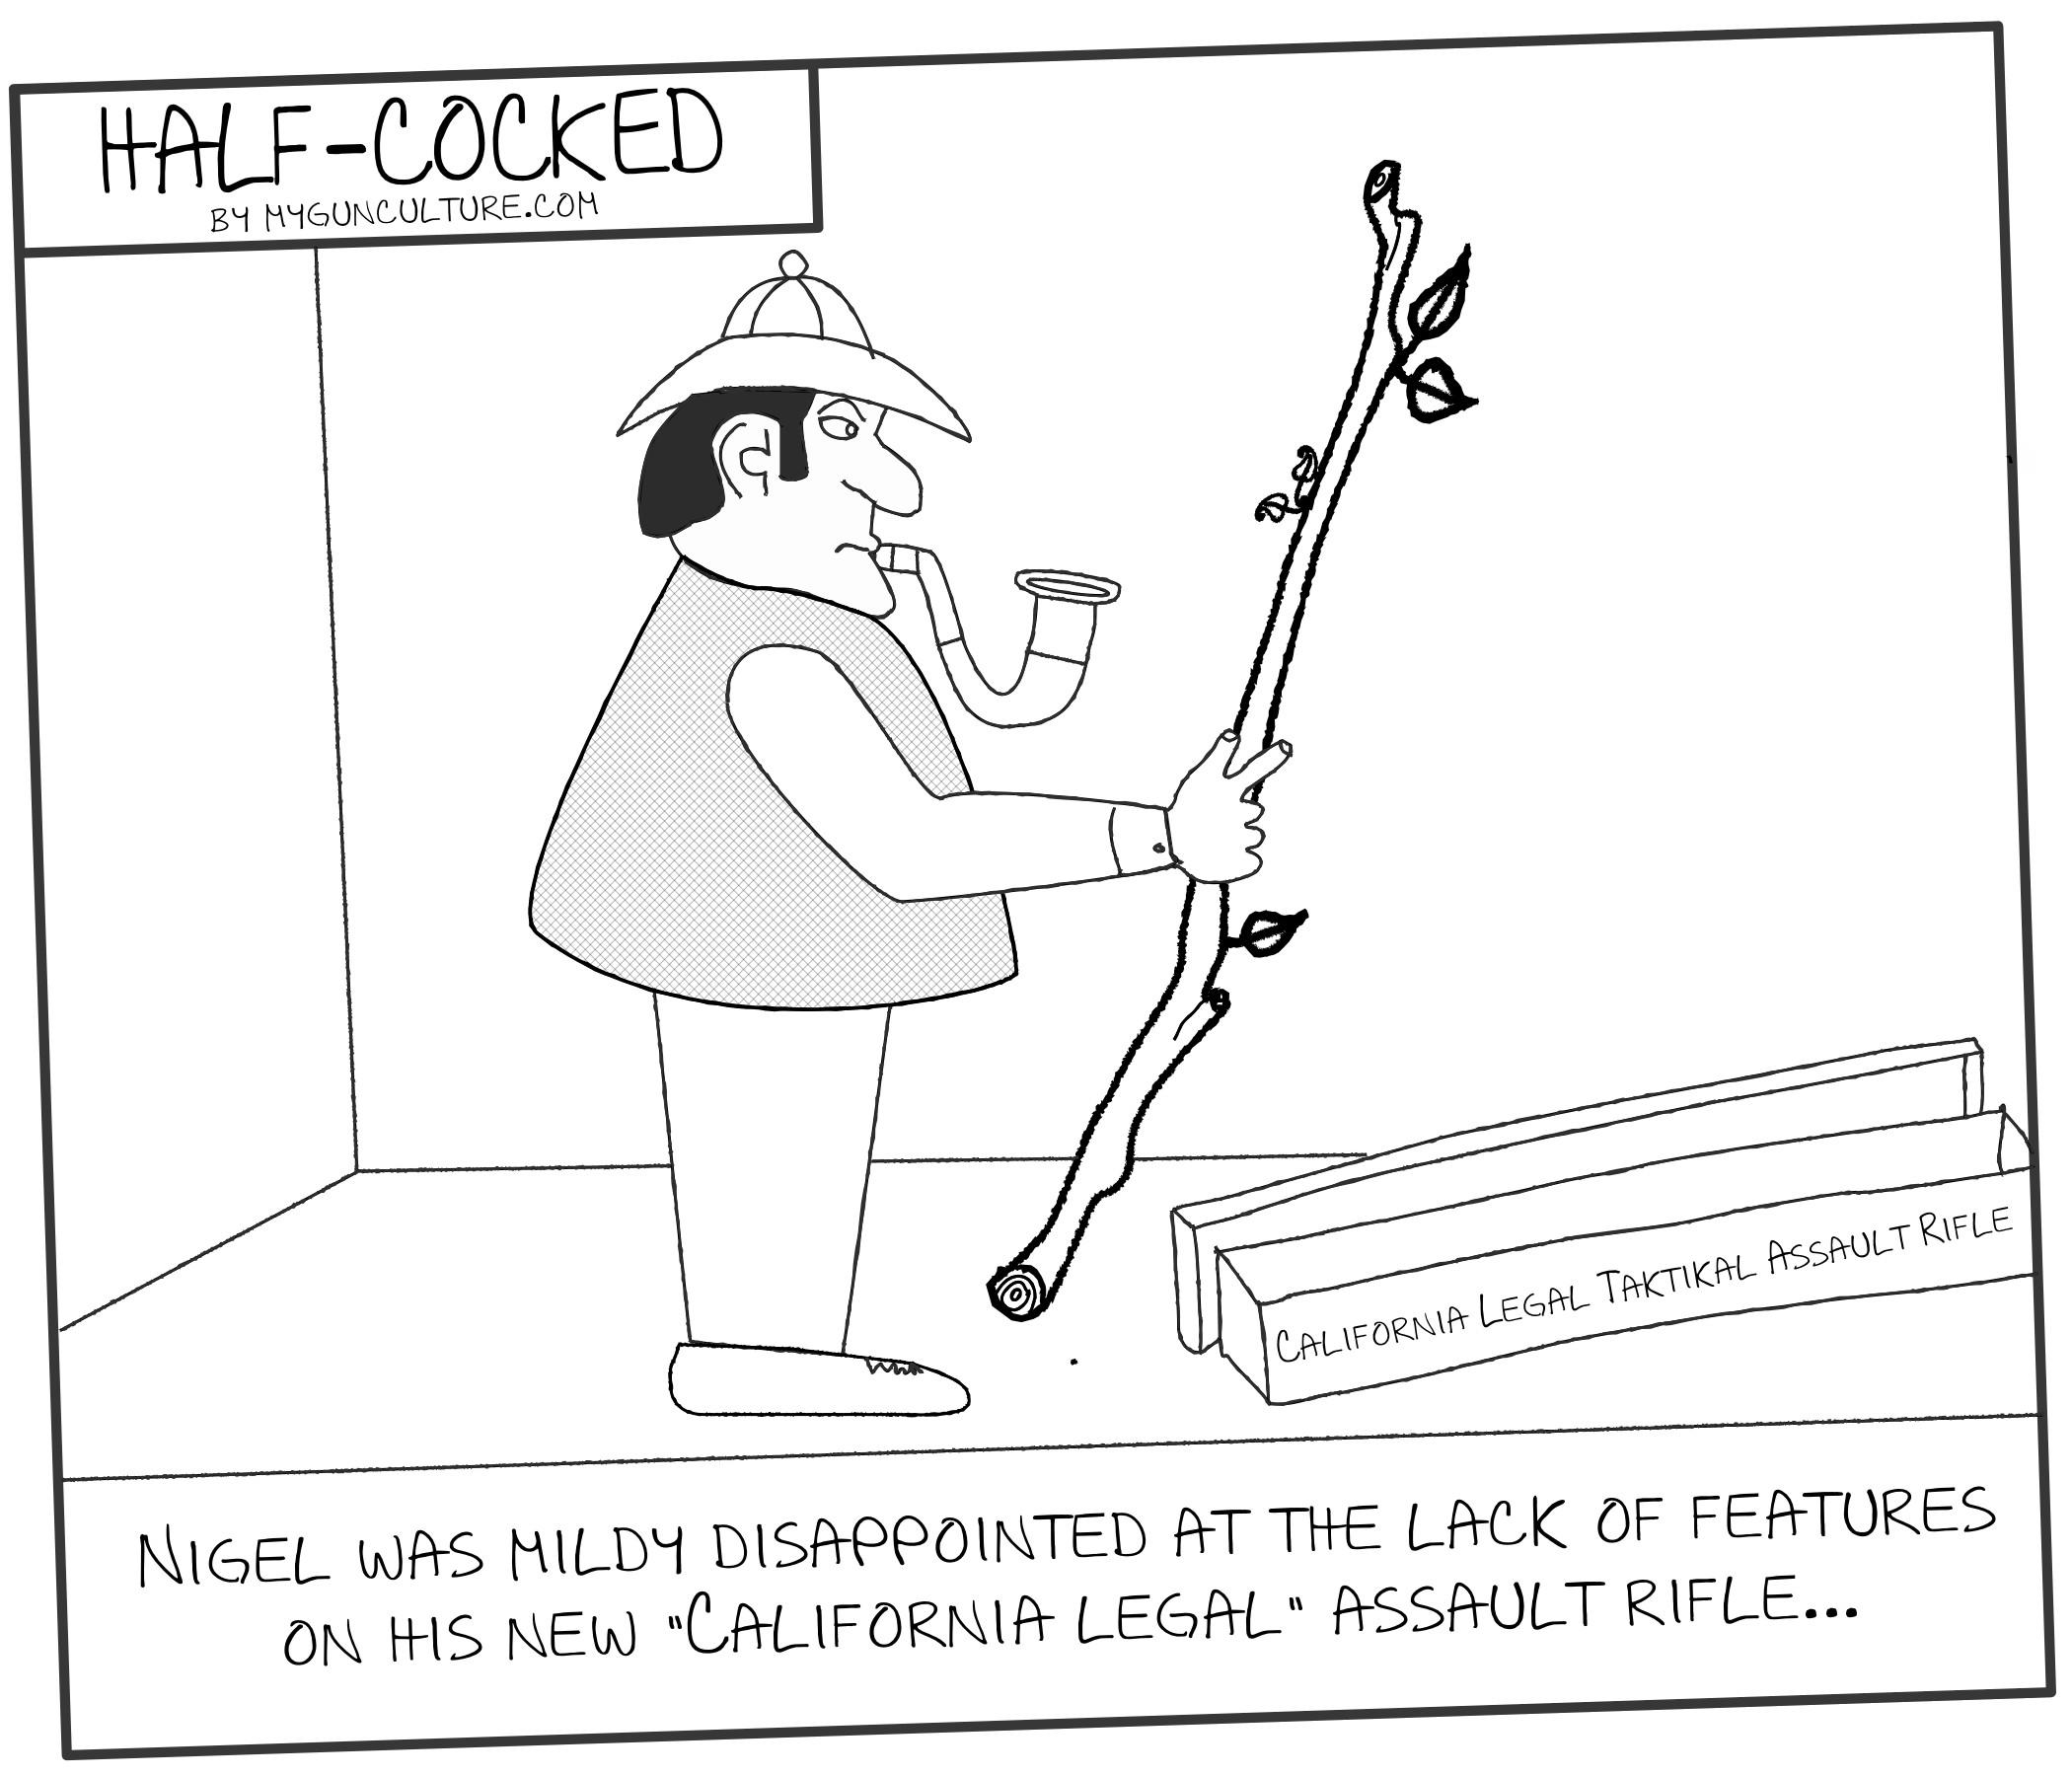 Half Cocked California Legal Assault Rifles